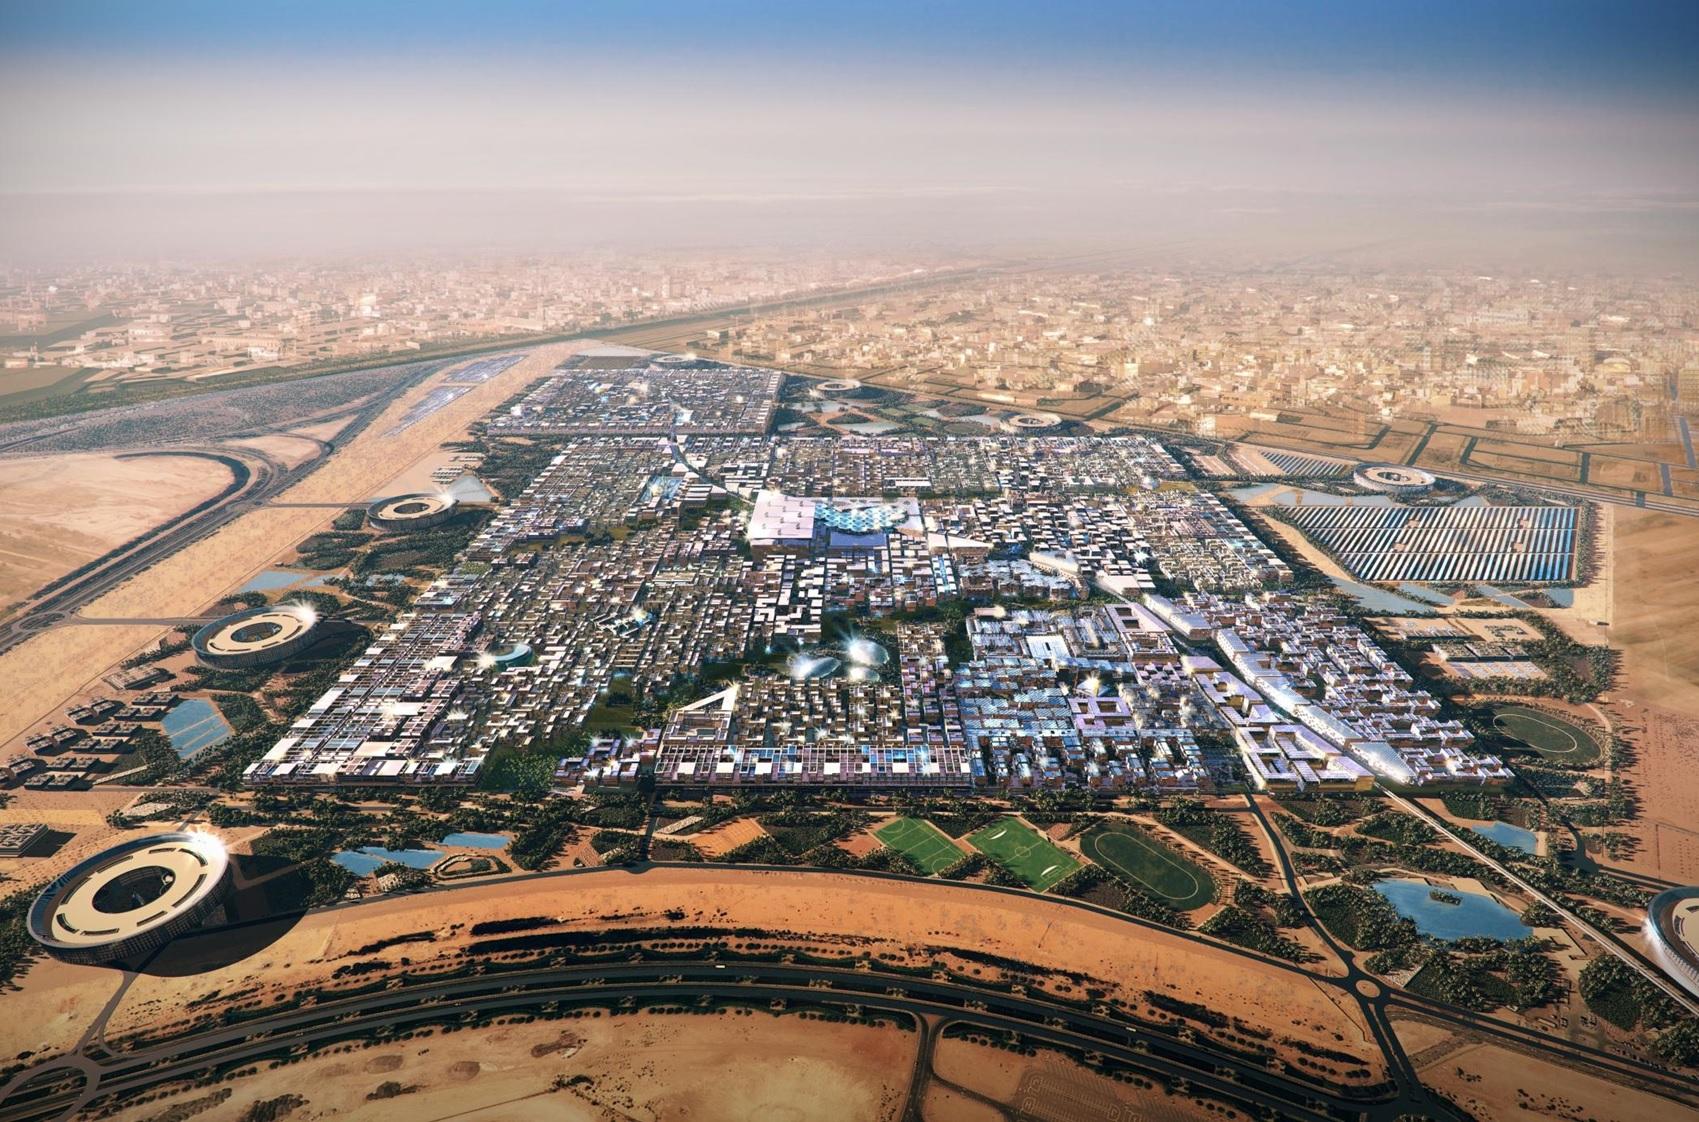 Systematica-Masdar City_Aerial Render View